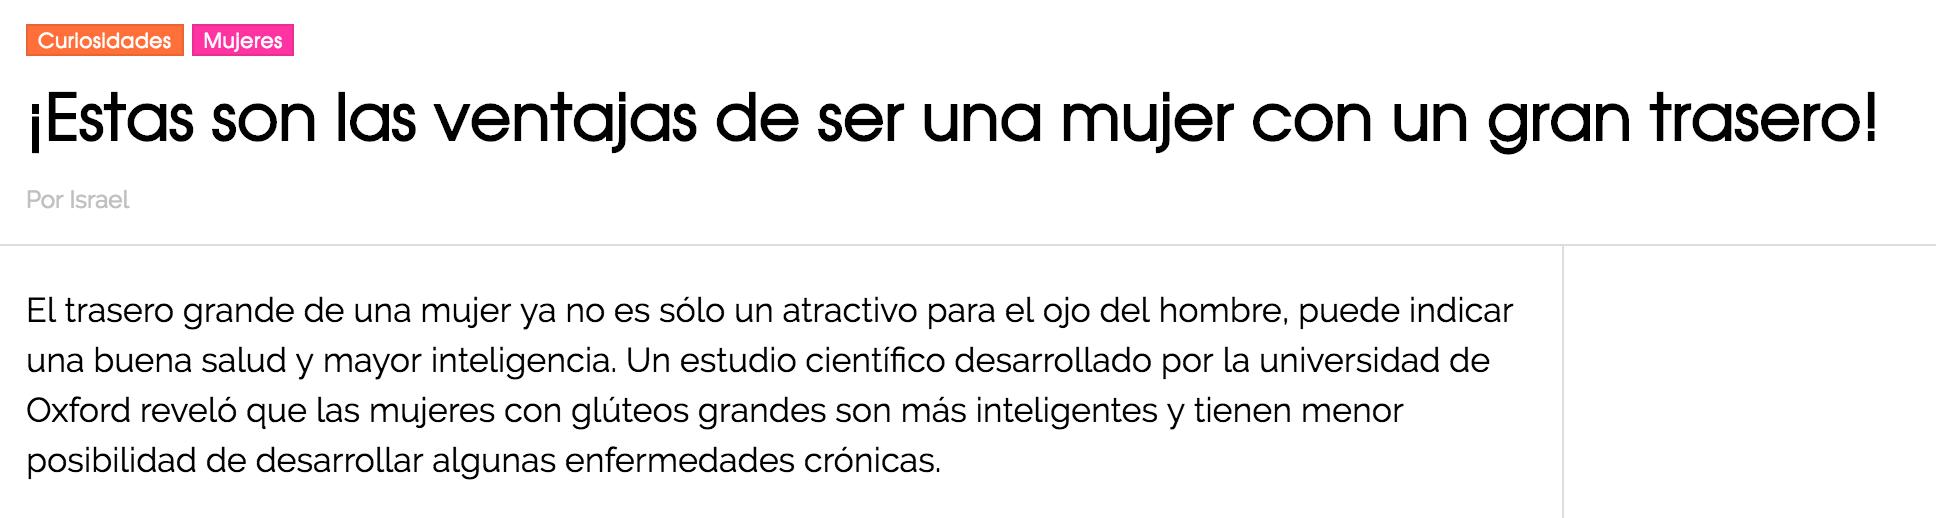 Marmotazos-inteligencia_7